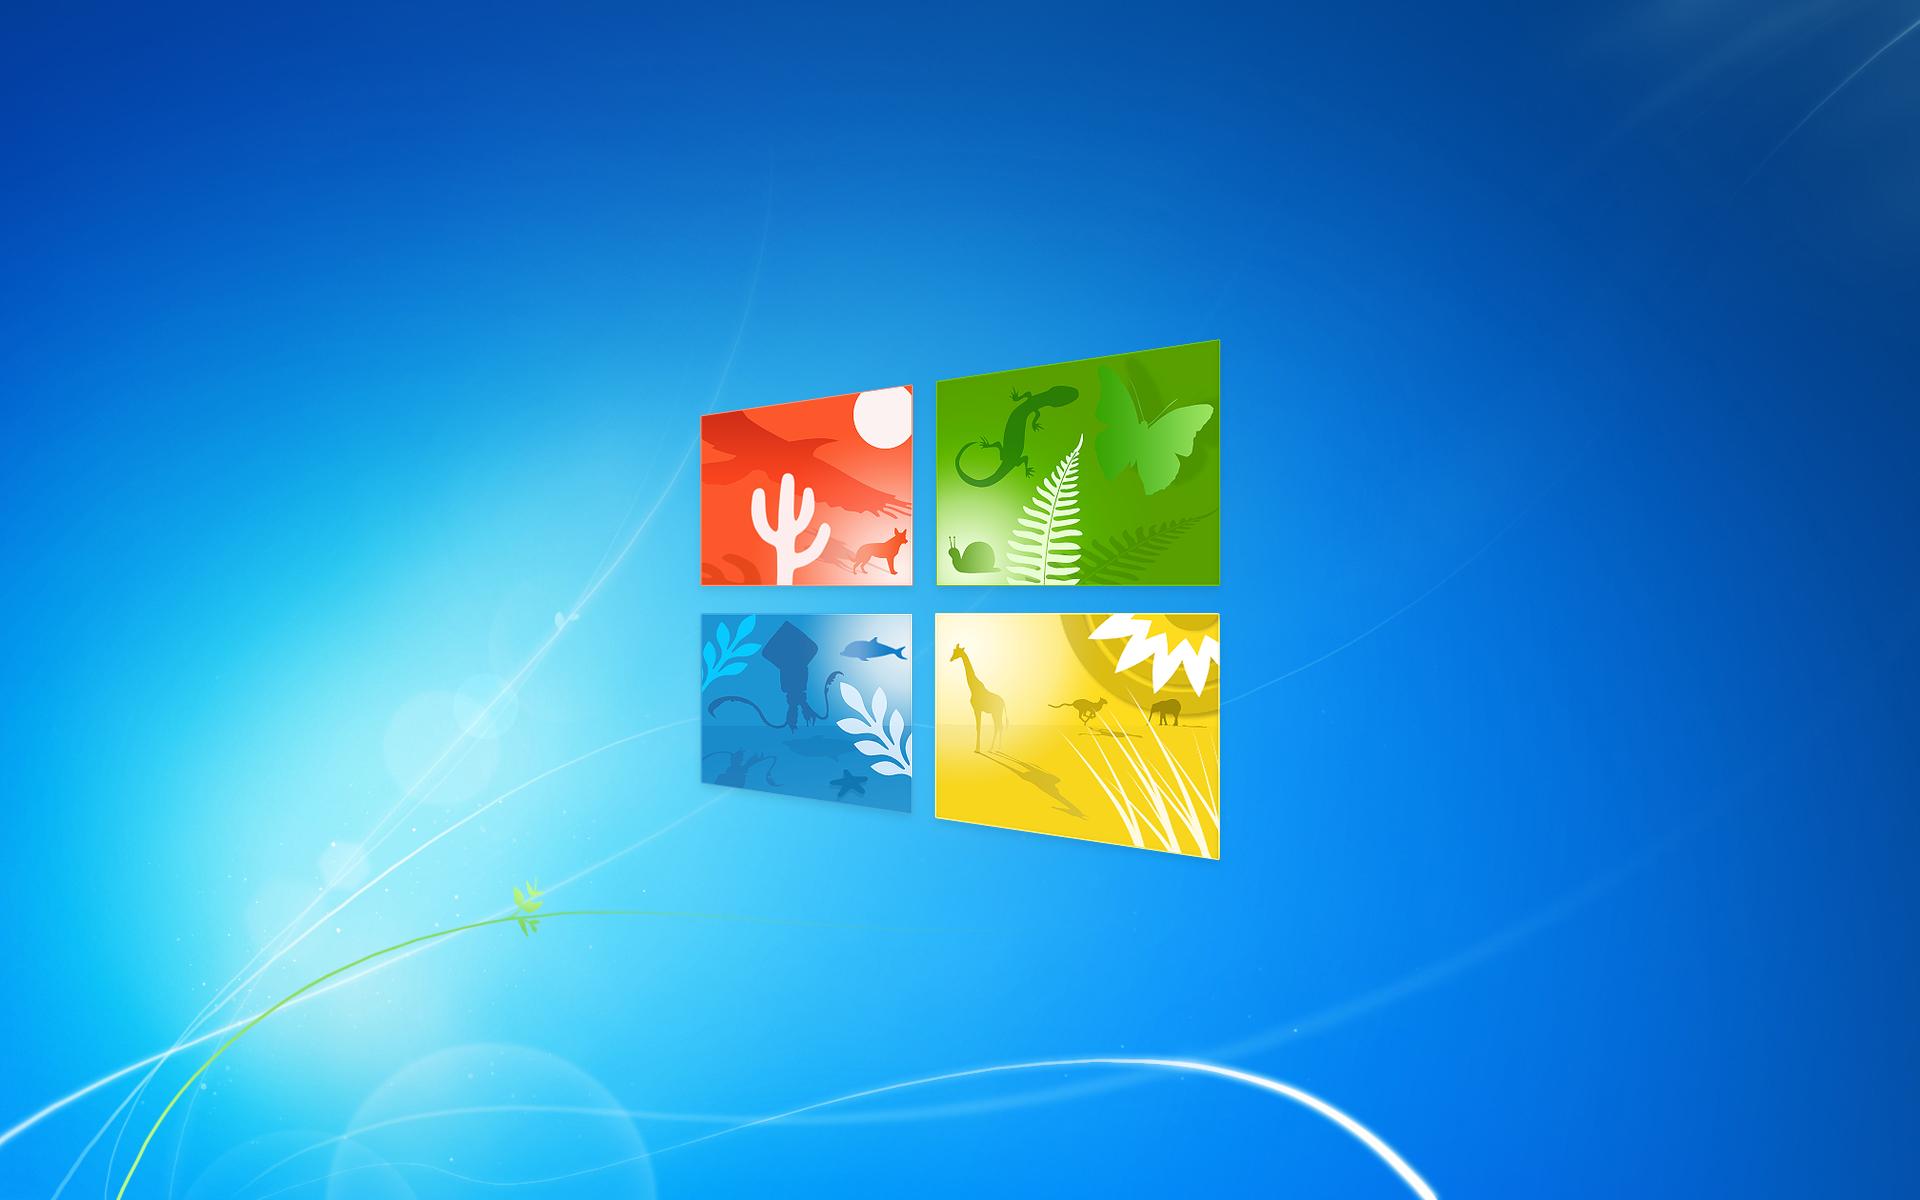 Microsoft Desktop Hintergründe